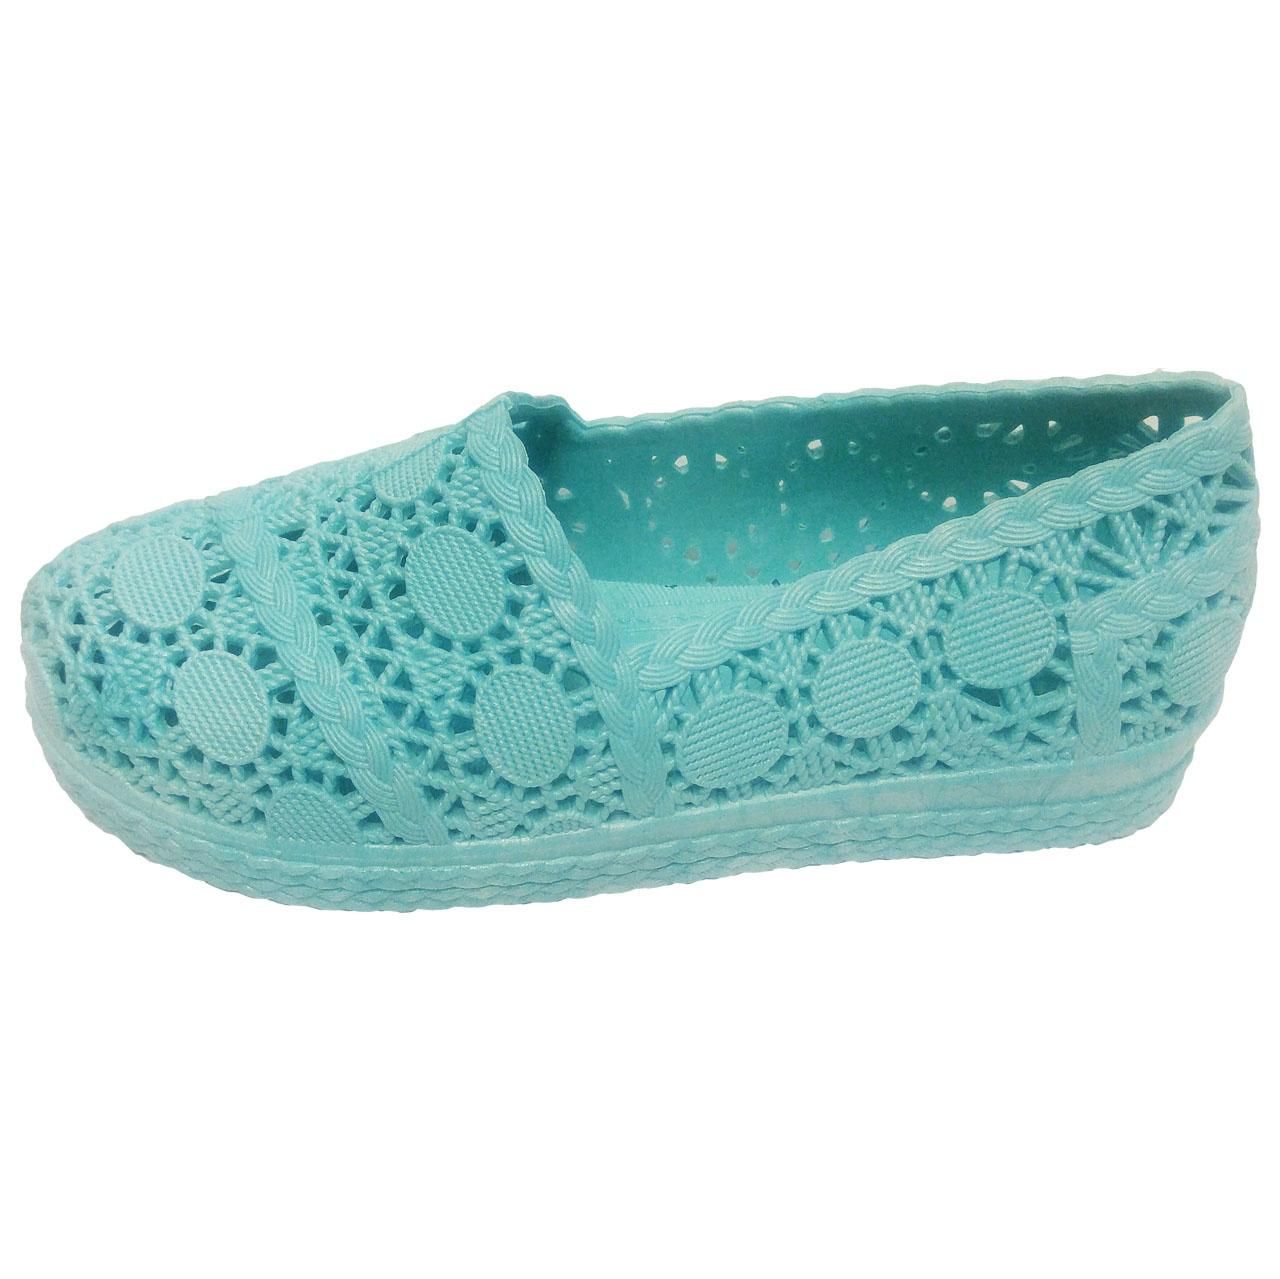 کفش روفرشی ژله ای آبرنگ مدل گیپور کد 014